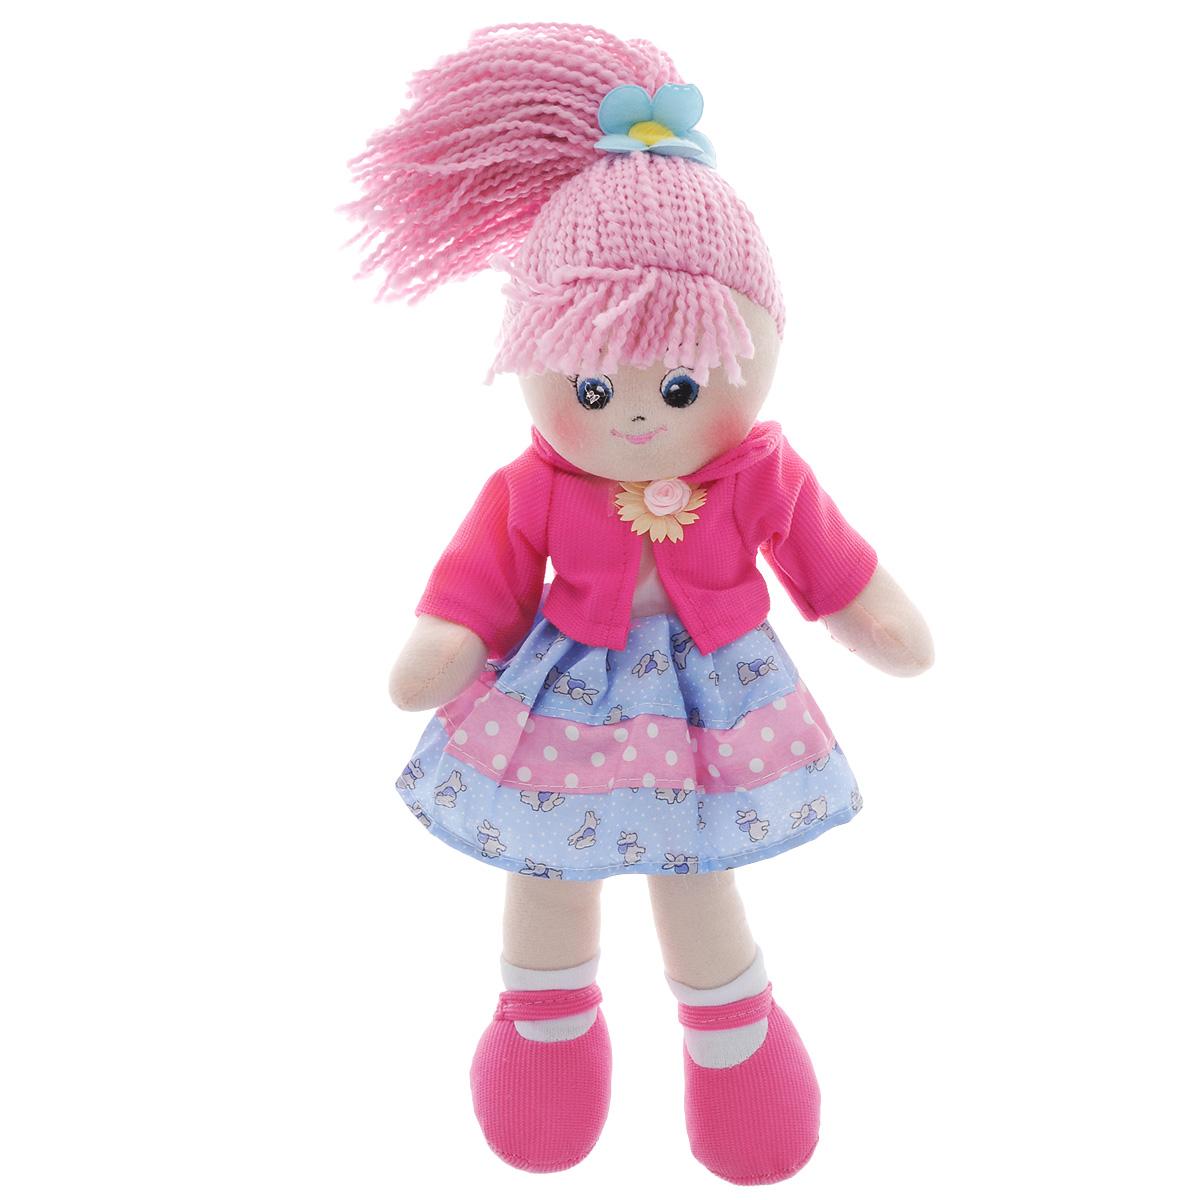 Мягкая игрушка Gulliver Кукла Земляничка, 40 см куклы gulliver кукла дынька 30см